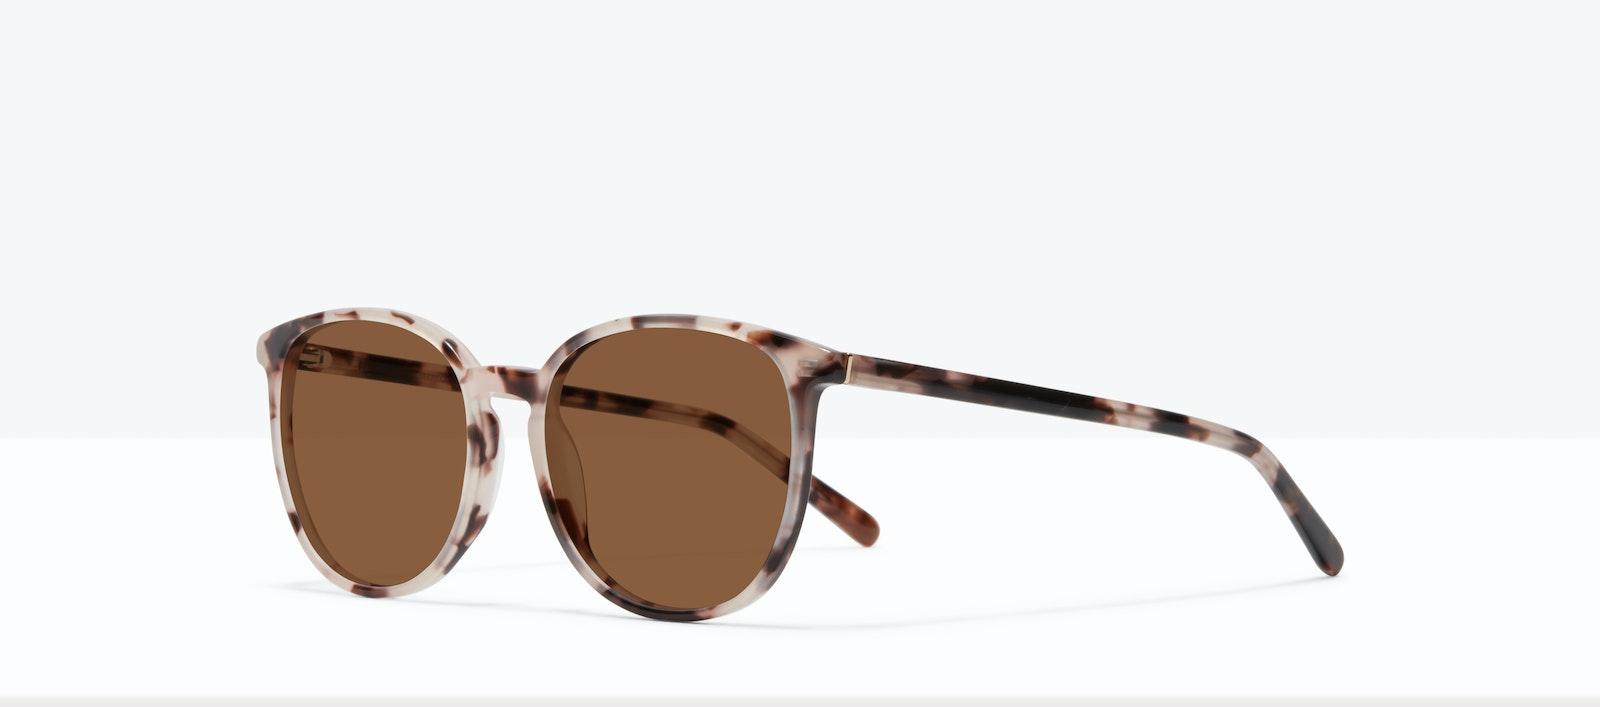 Affordable Fashion Glasses Round Sunglasses Women Femme Libre L Erzebeth Tilt